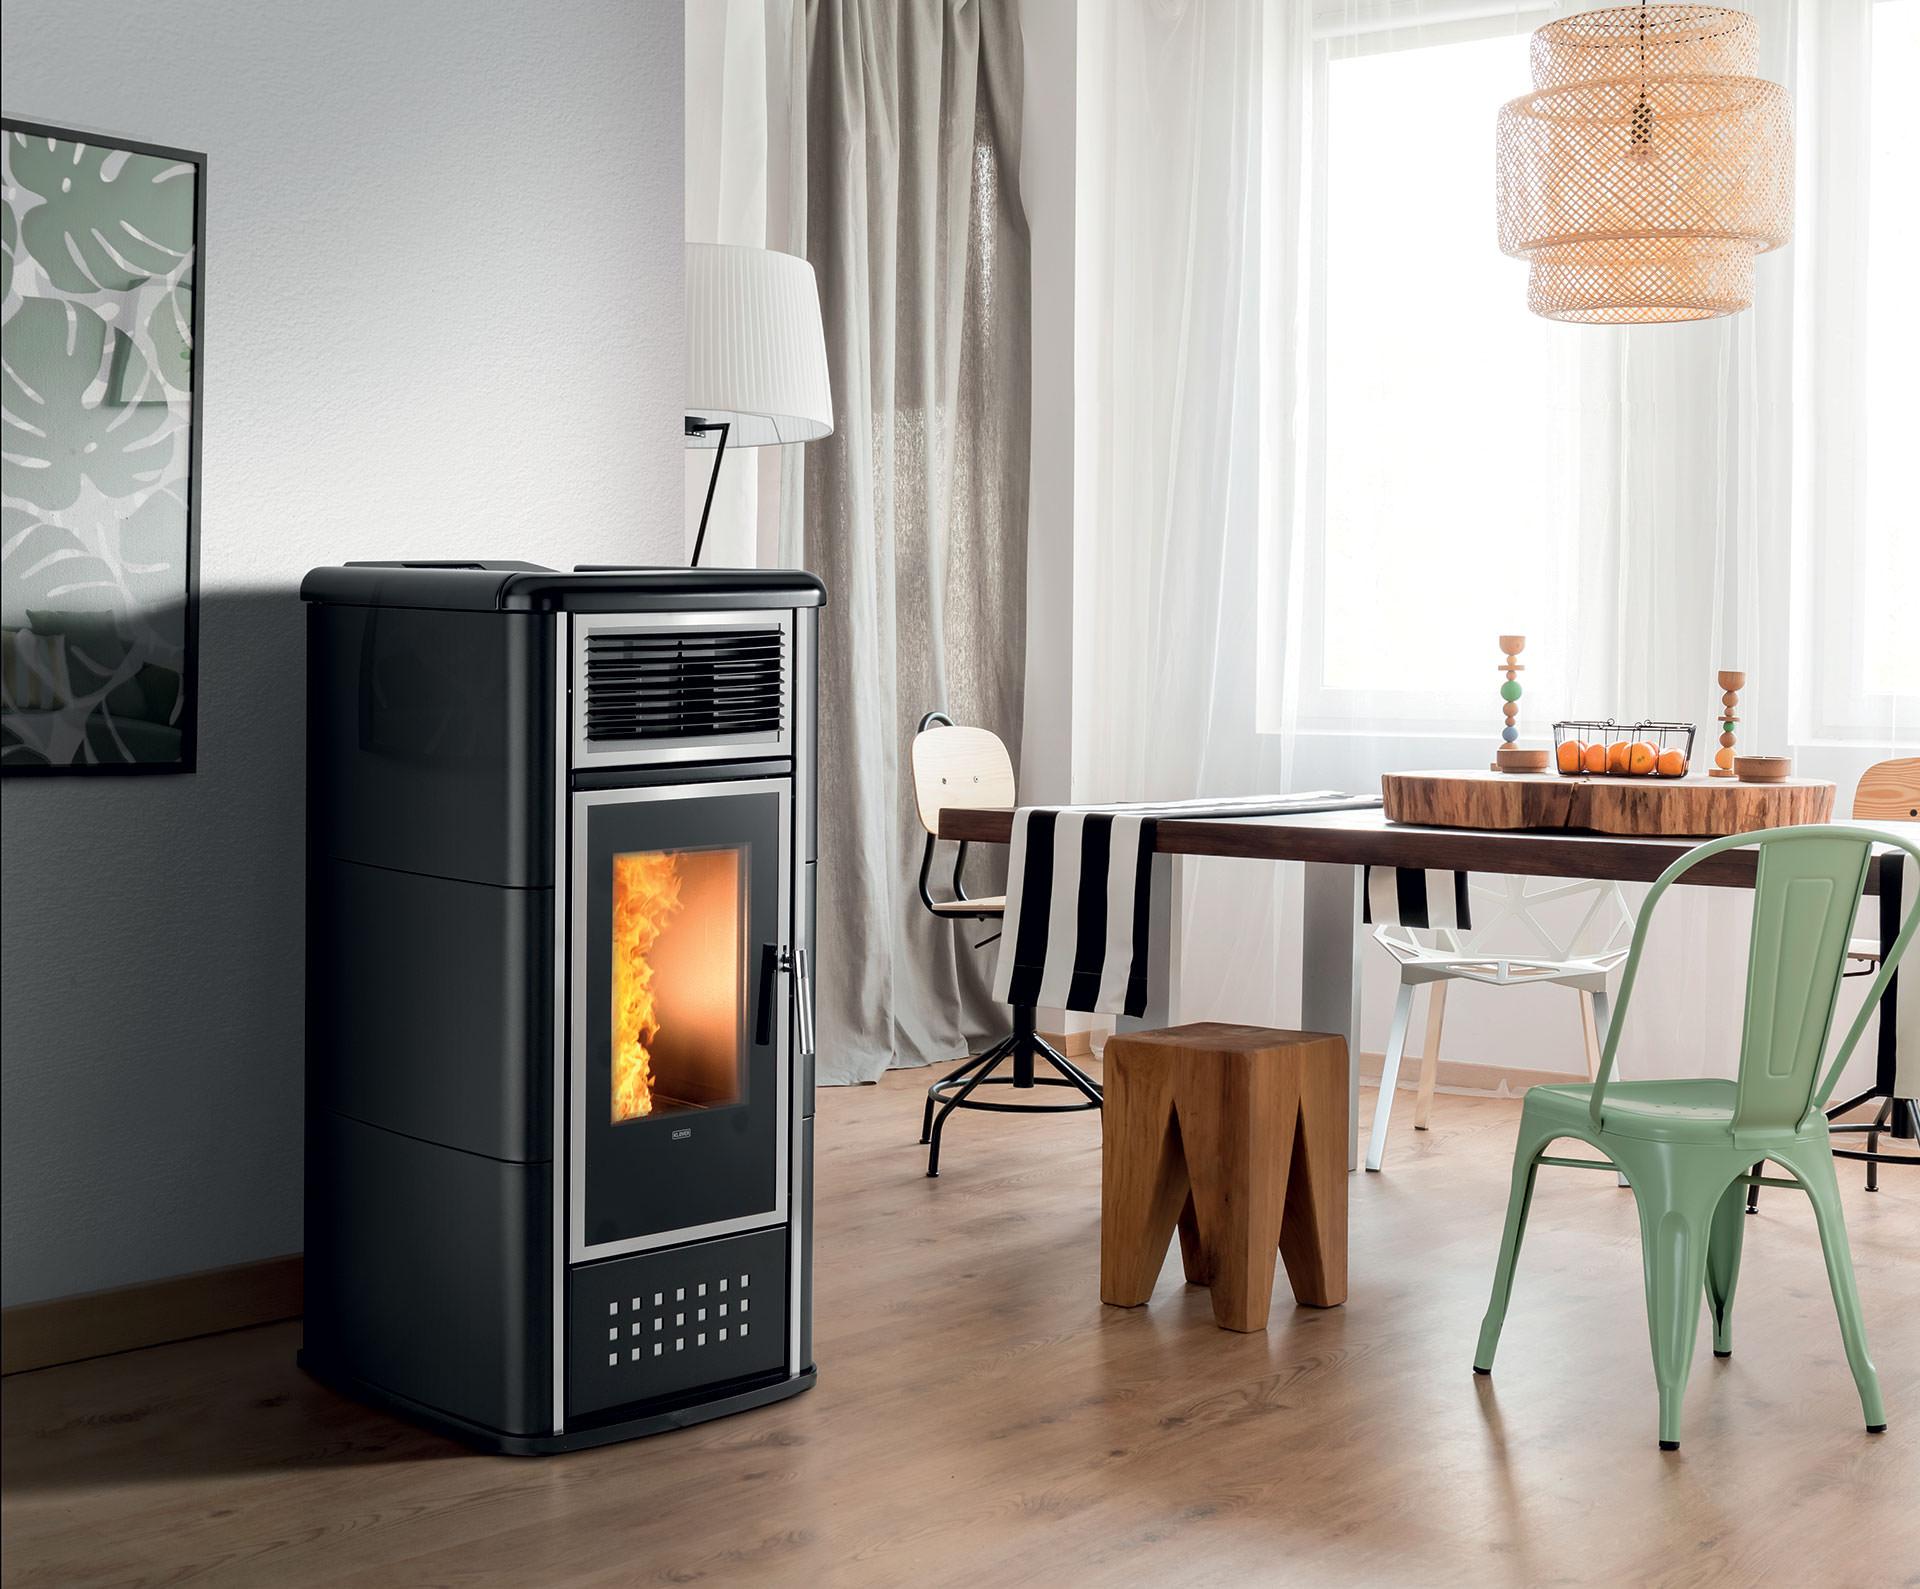 Tubi Aria Calda Stufa Pellet termostufa a pellet belvedere 22 top - klover | ciesse